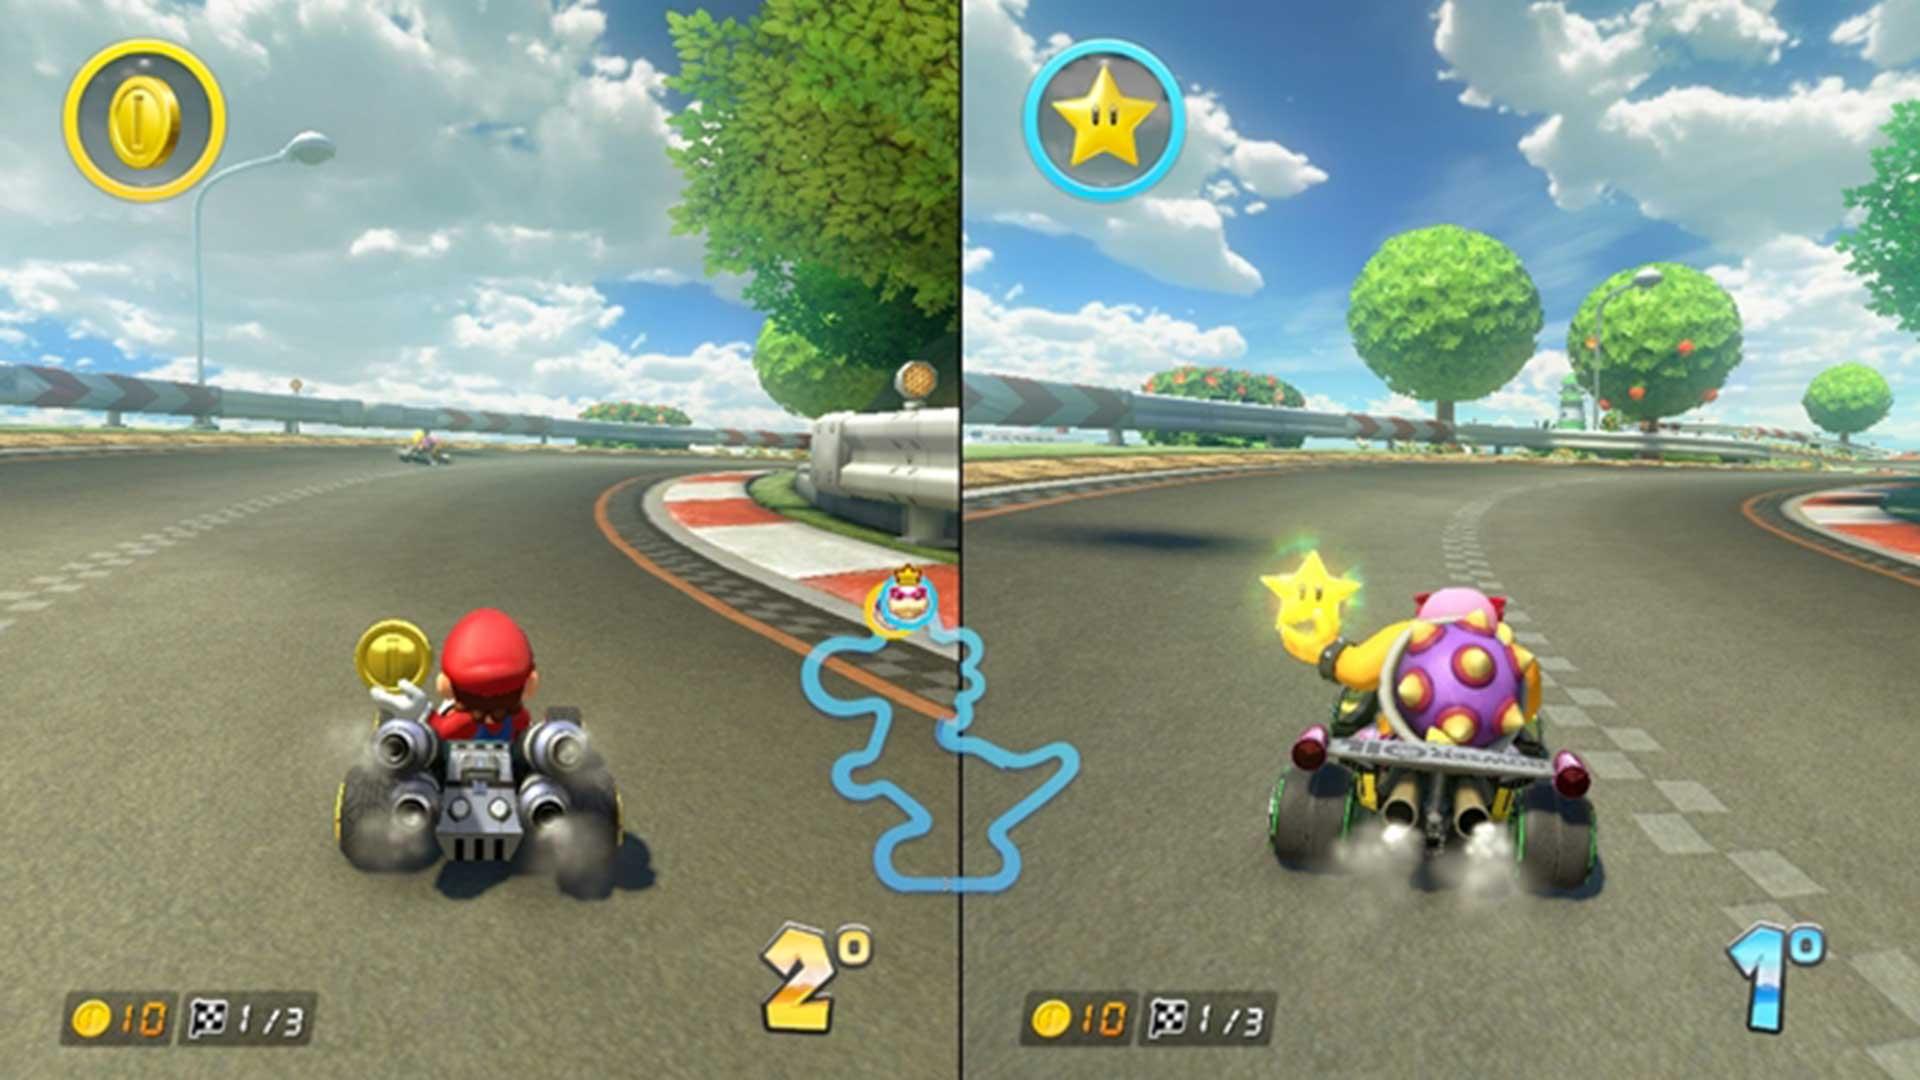 Mario Kart 8 Deluxe objetos